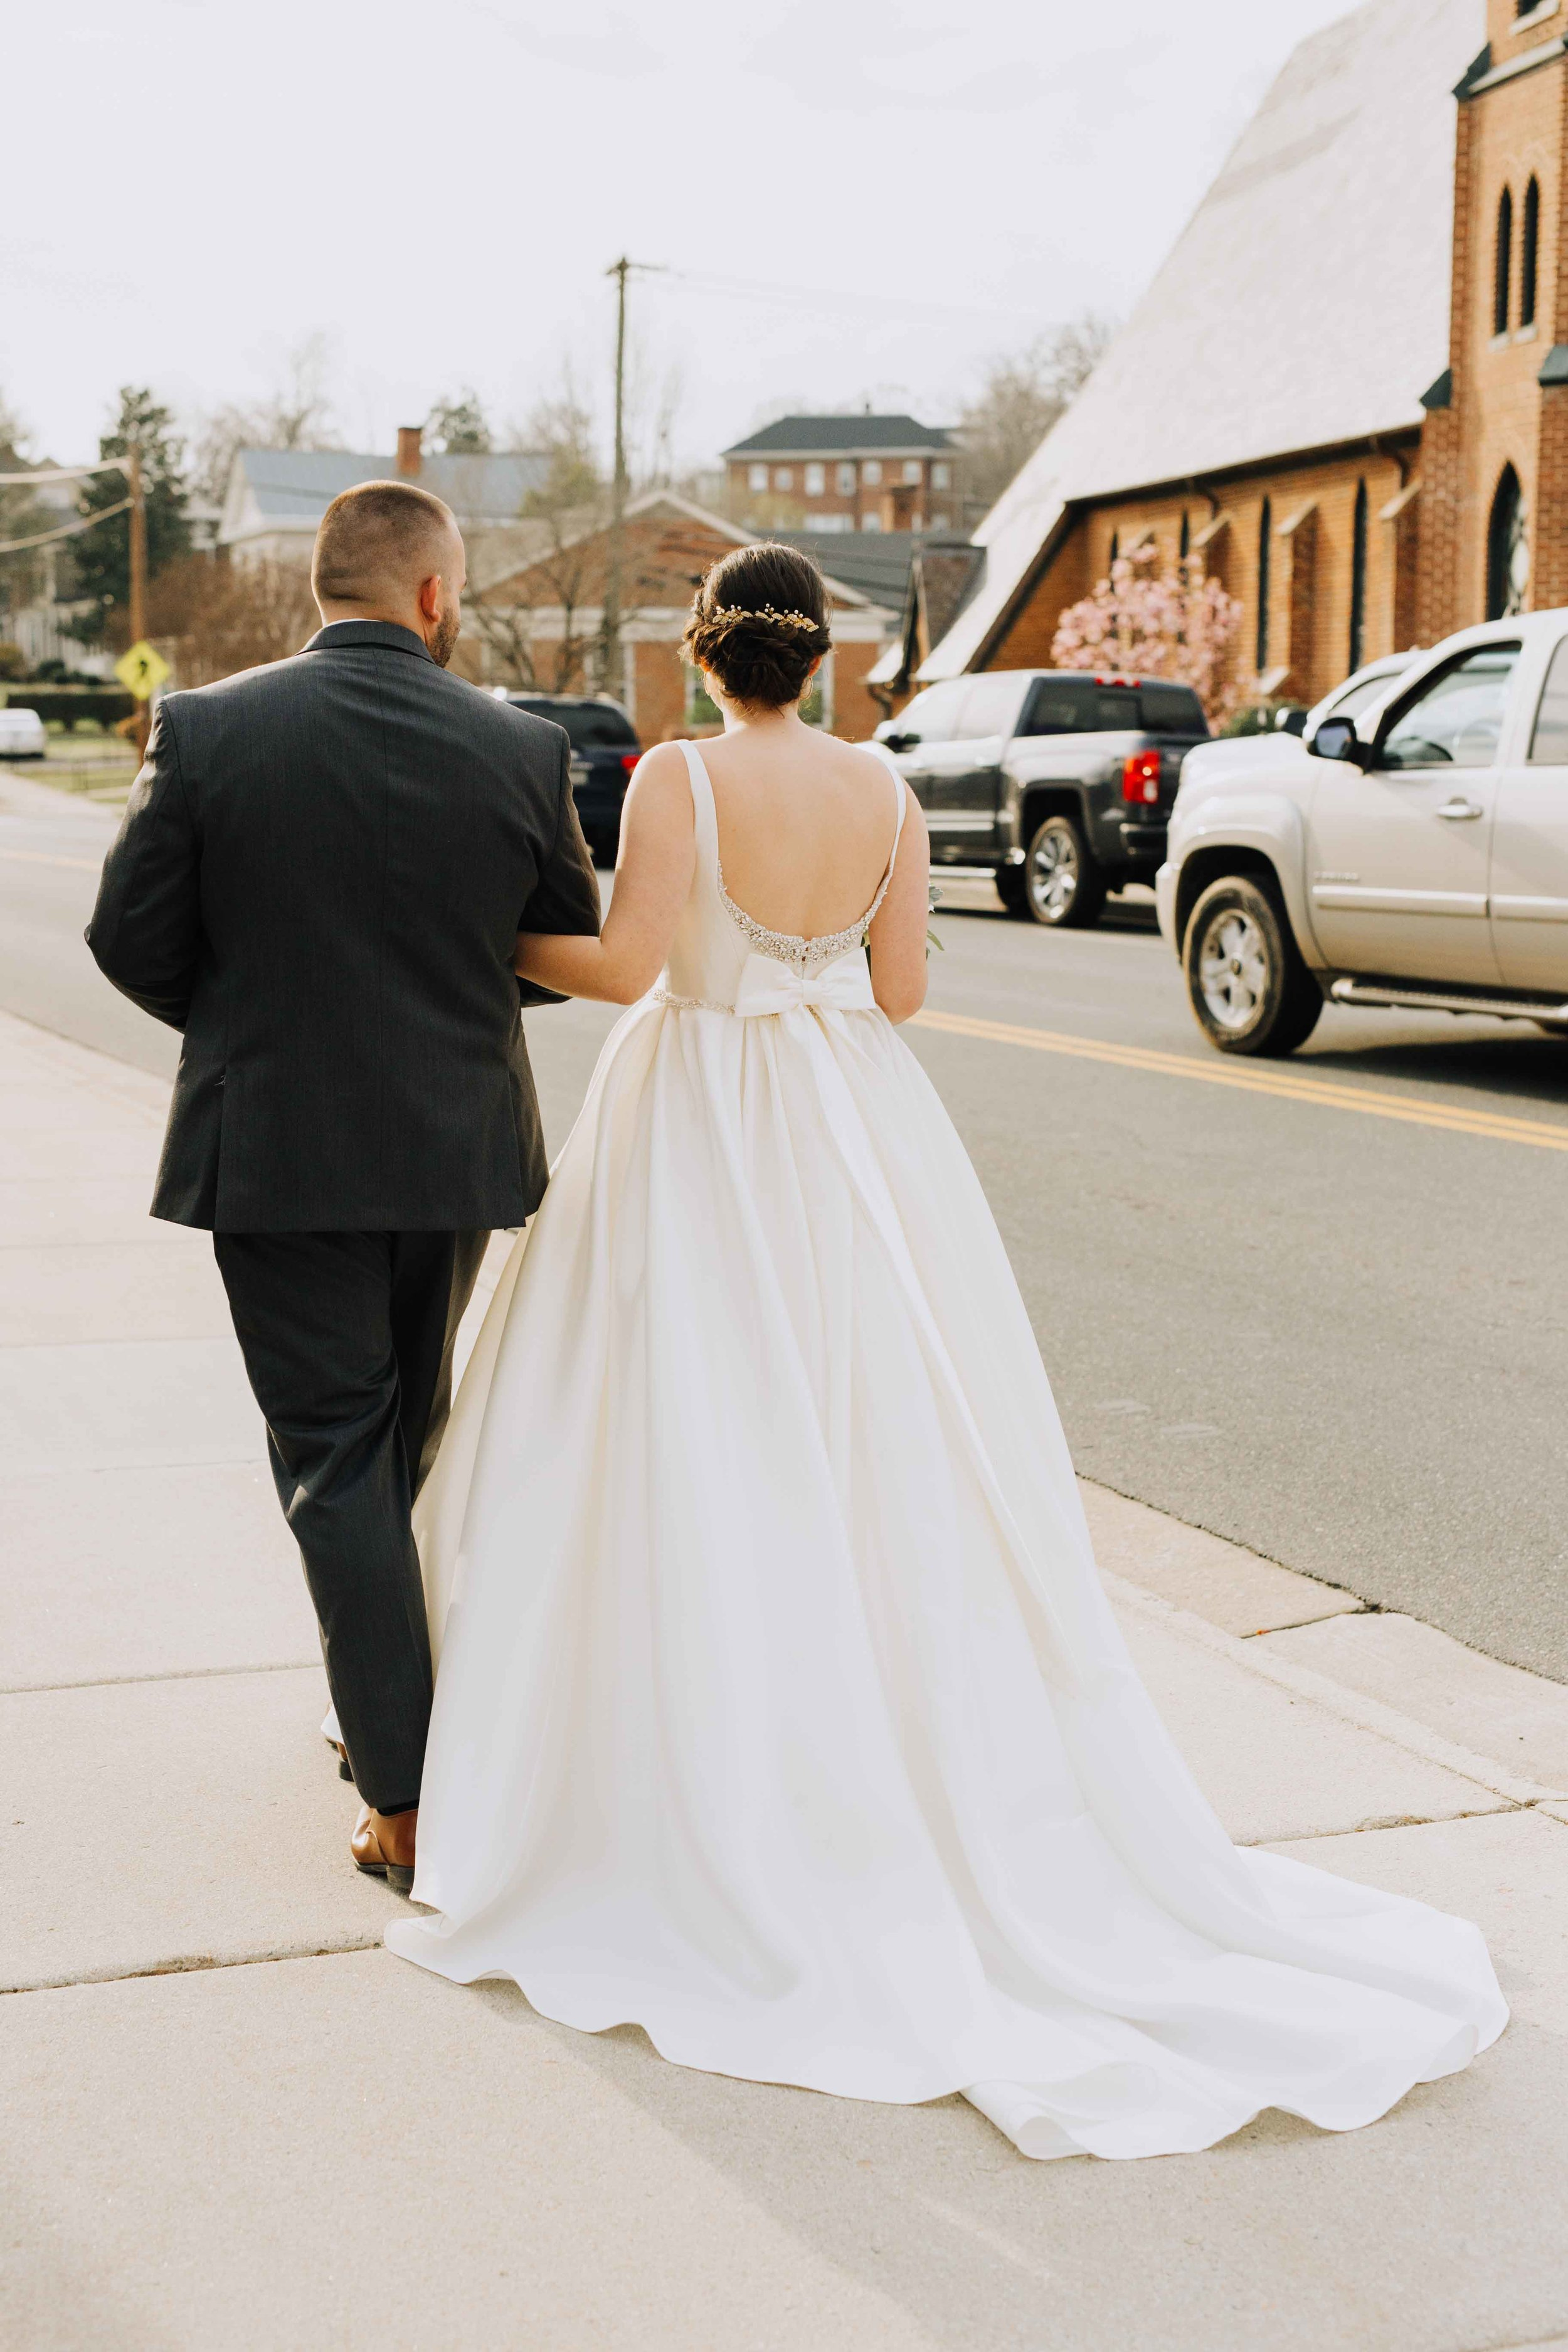 Farmville-Virginia-Wedding-Hotel-Weynoke-Downtown-Jacqueline-Waters-Photography-Detailed- (899).jpg